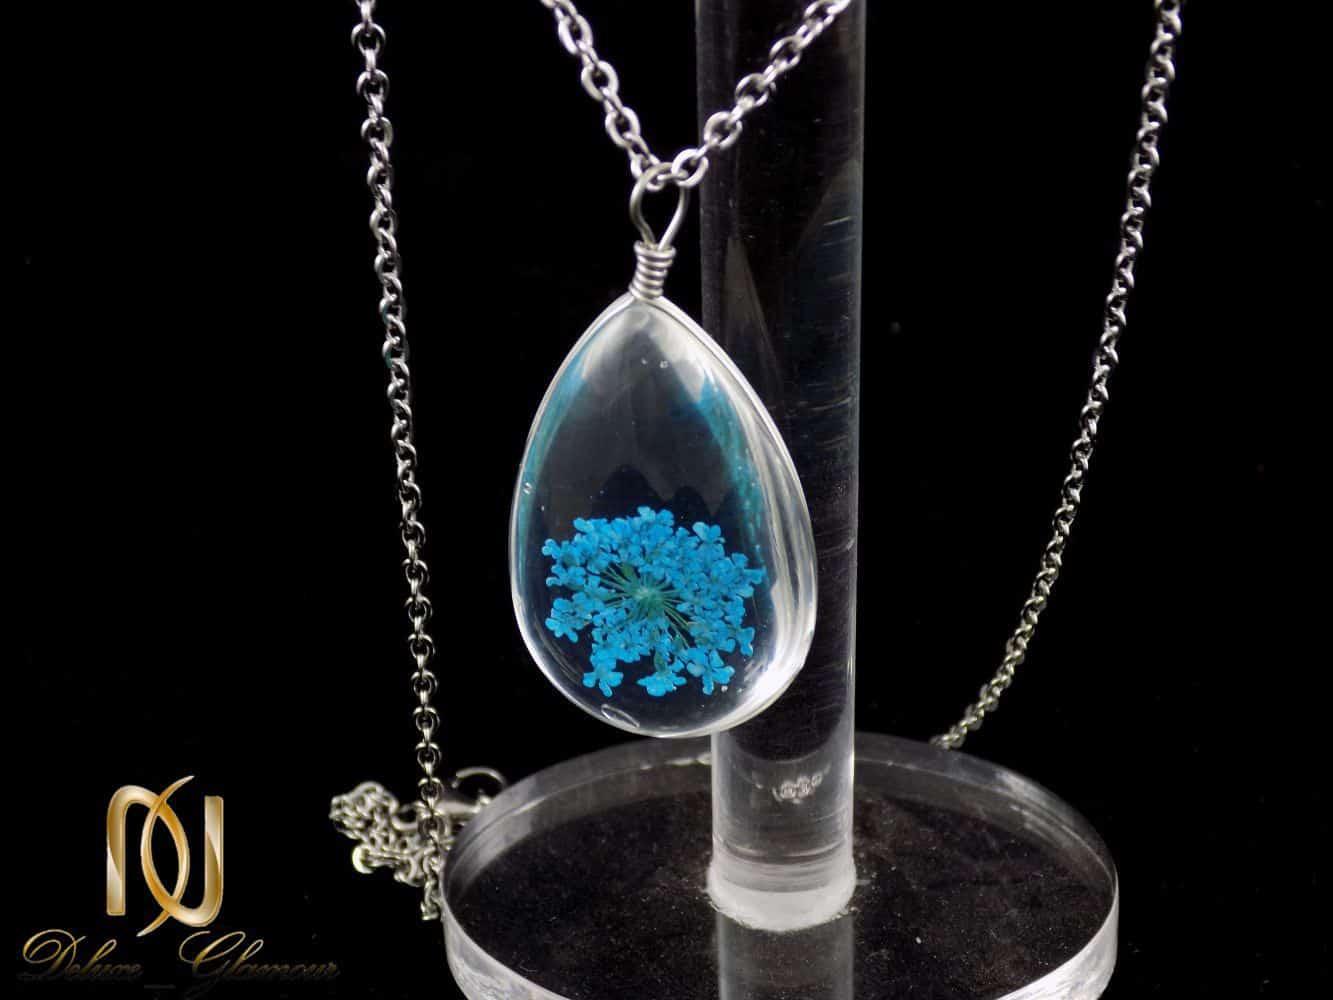 گردنبند رومانتویی طرح آکواریوم گل خشک آبی به همراه زنجیر nw-n196 (3)